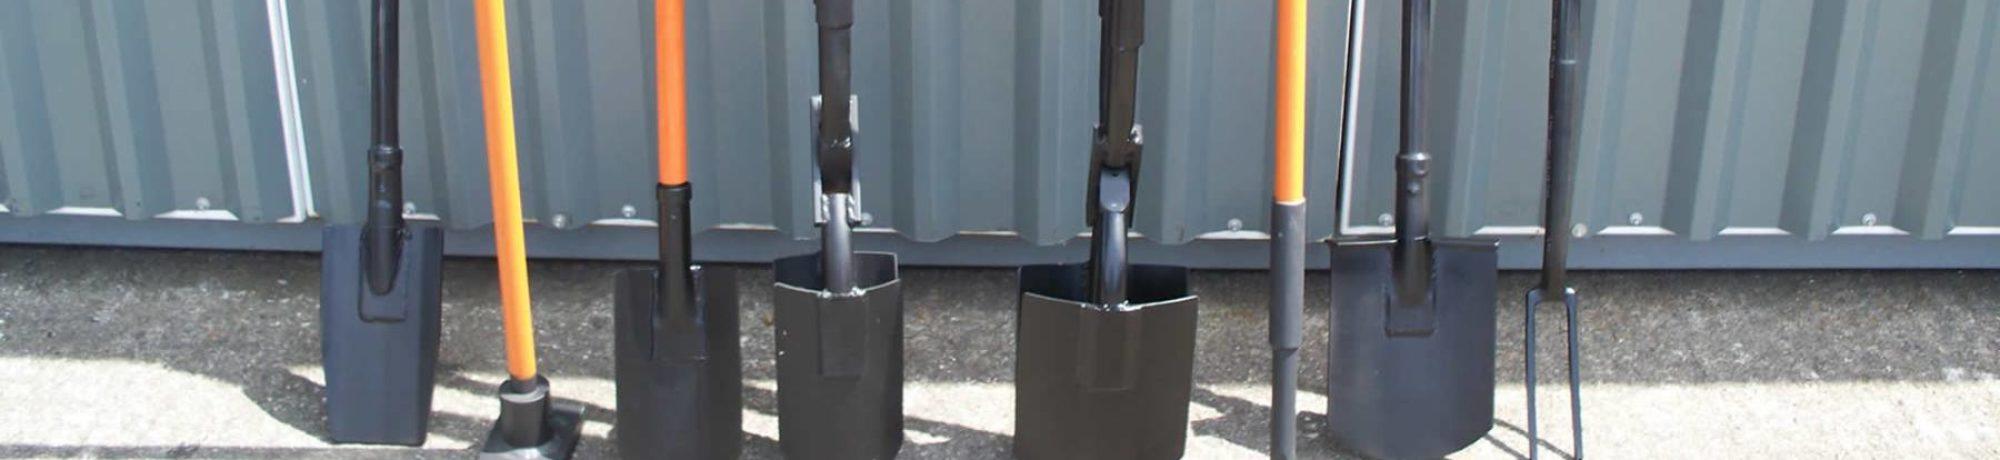 banner-bg-tools